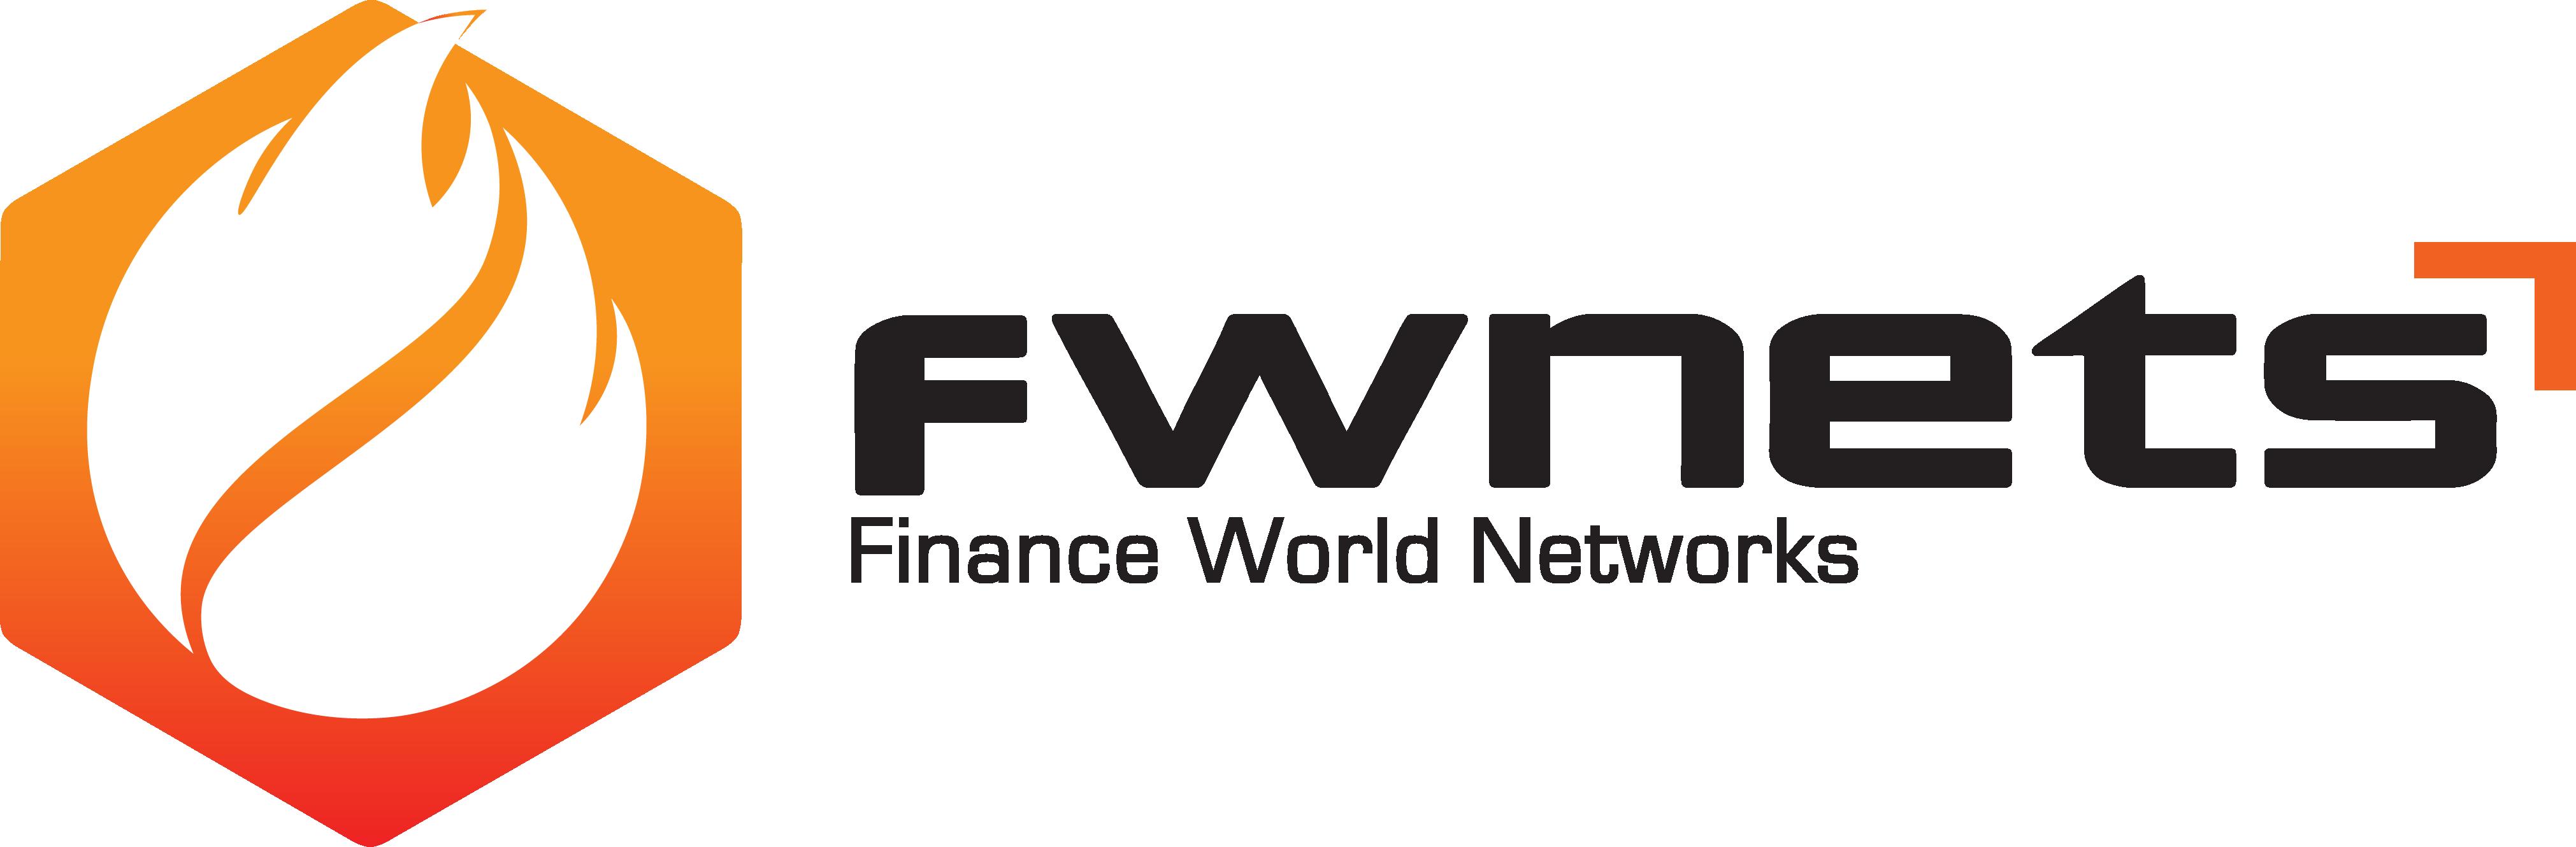 fwnets logo